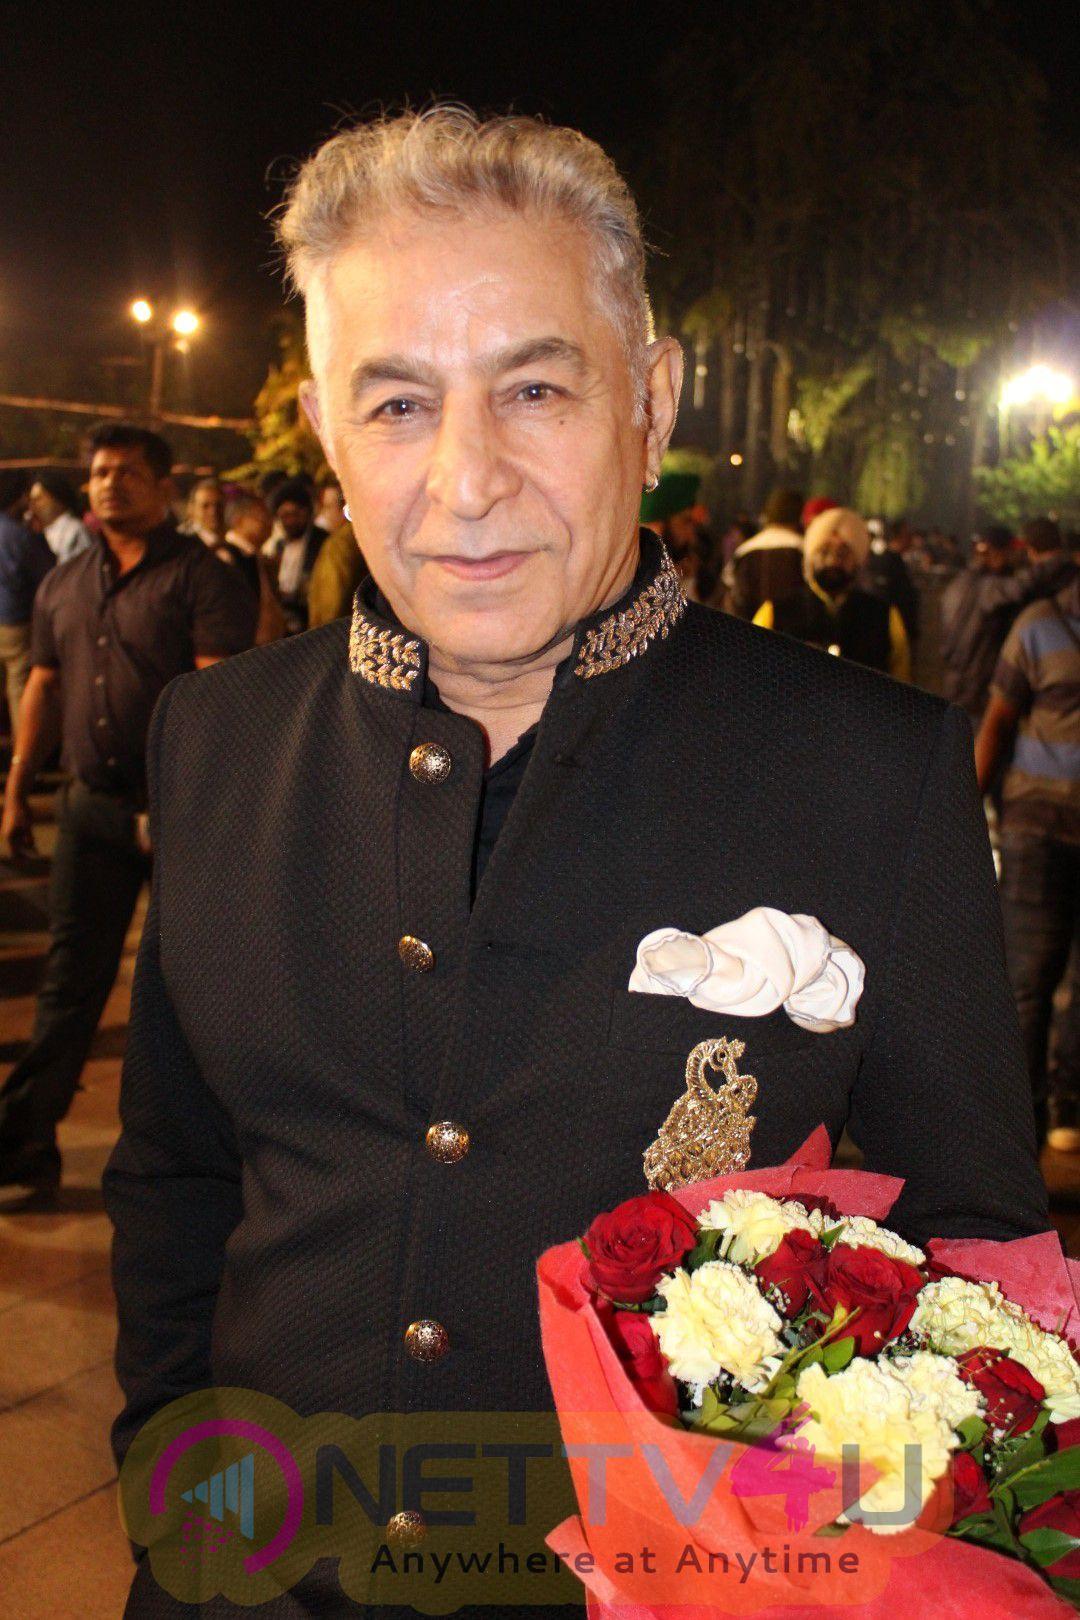 Shri Charan Singh Sapra Host Lohri Di Raat Celebration Stills